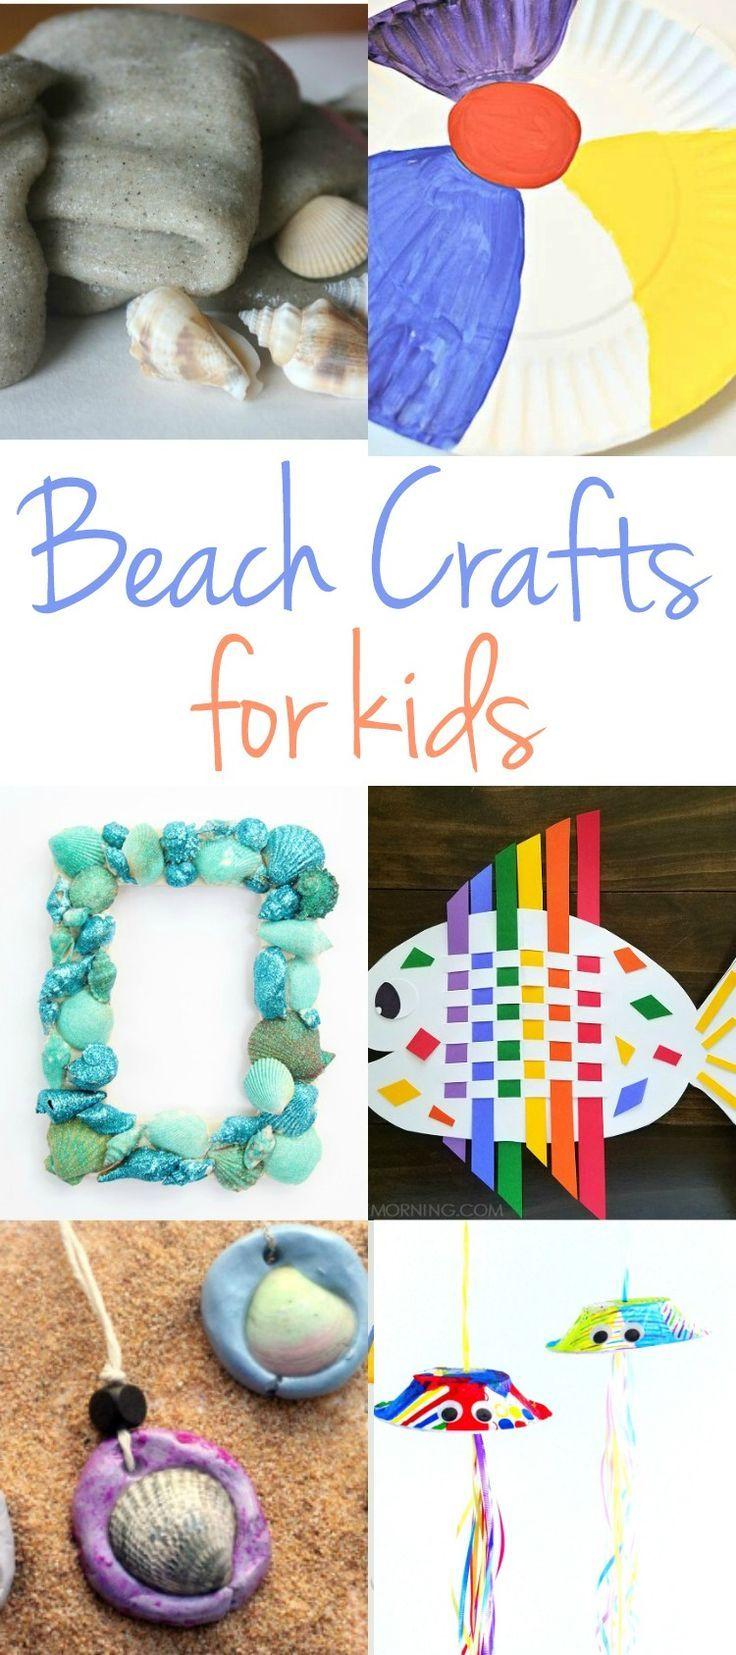 Beach Themed Crafts for Kids, Beach Crafts for Kids, Beach Slime, Shell Crafts, Beach Crafts for Preschoolers, Easy Beach Craft Ideas, Summer Fun Ideas